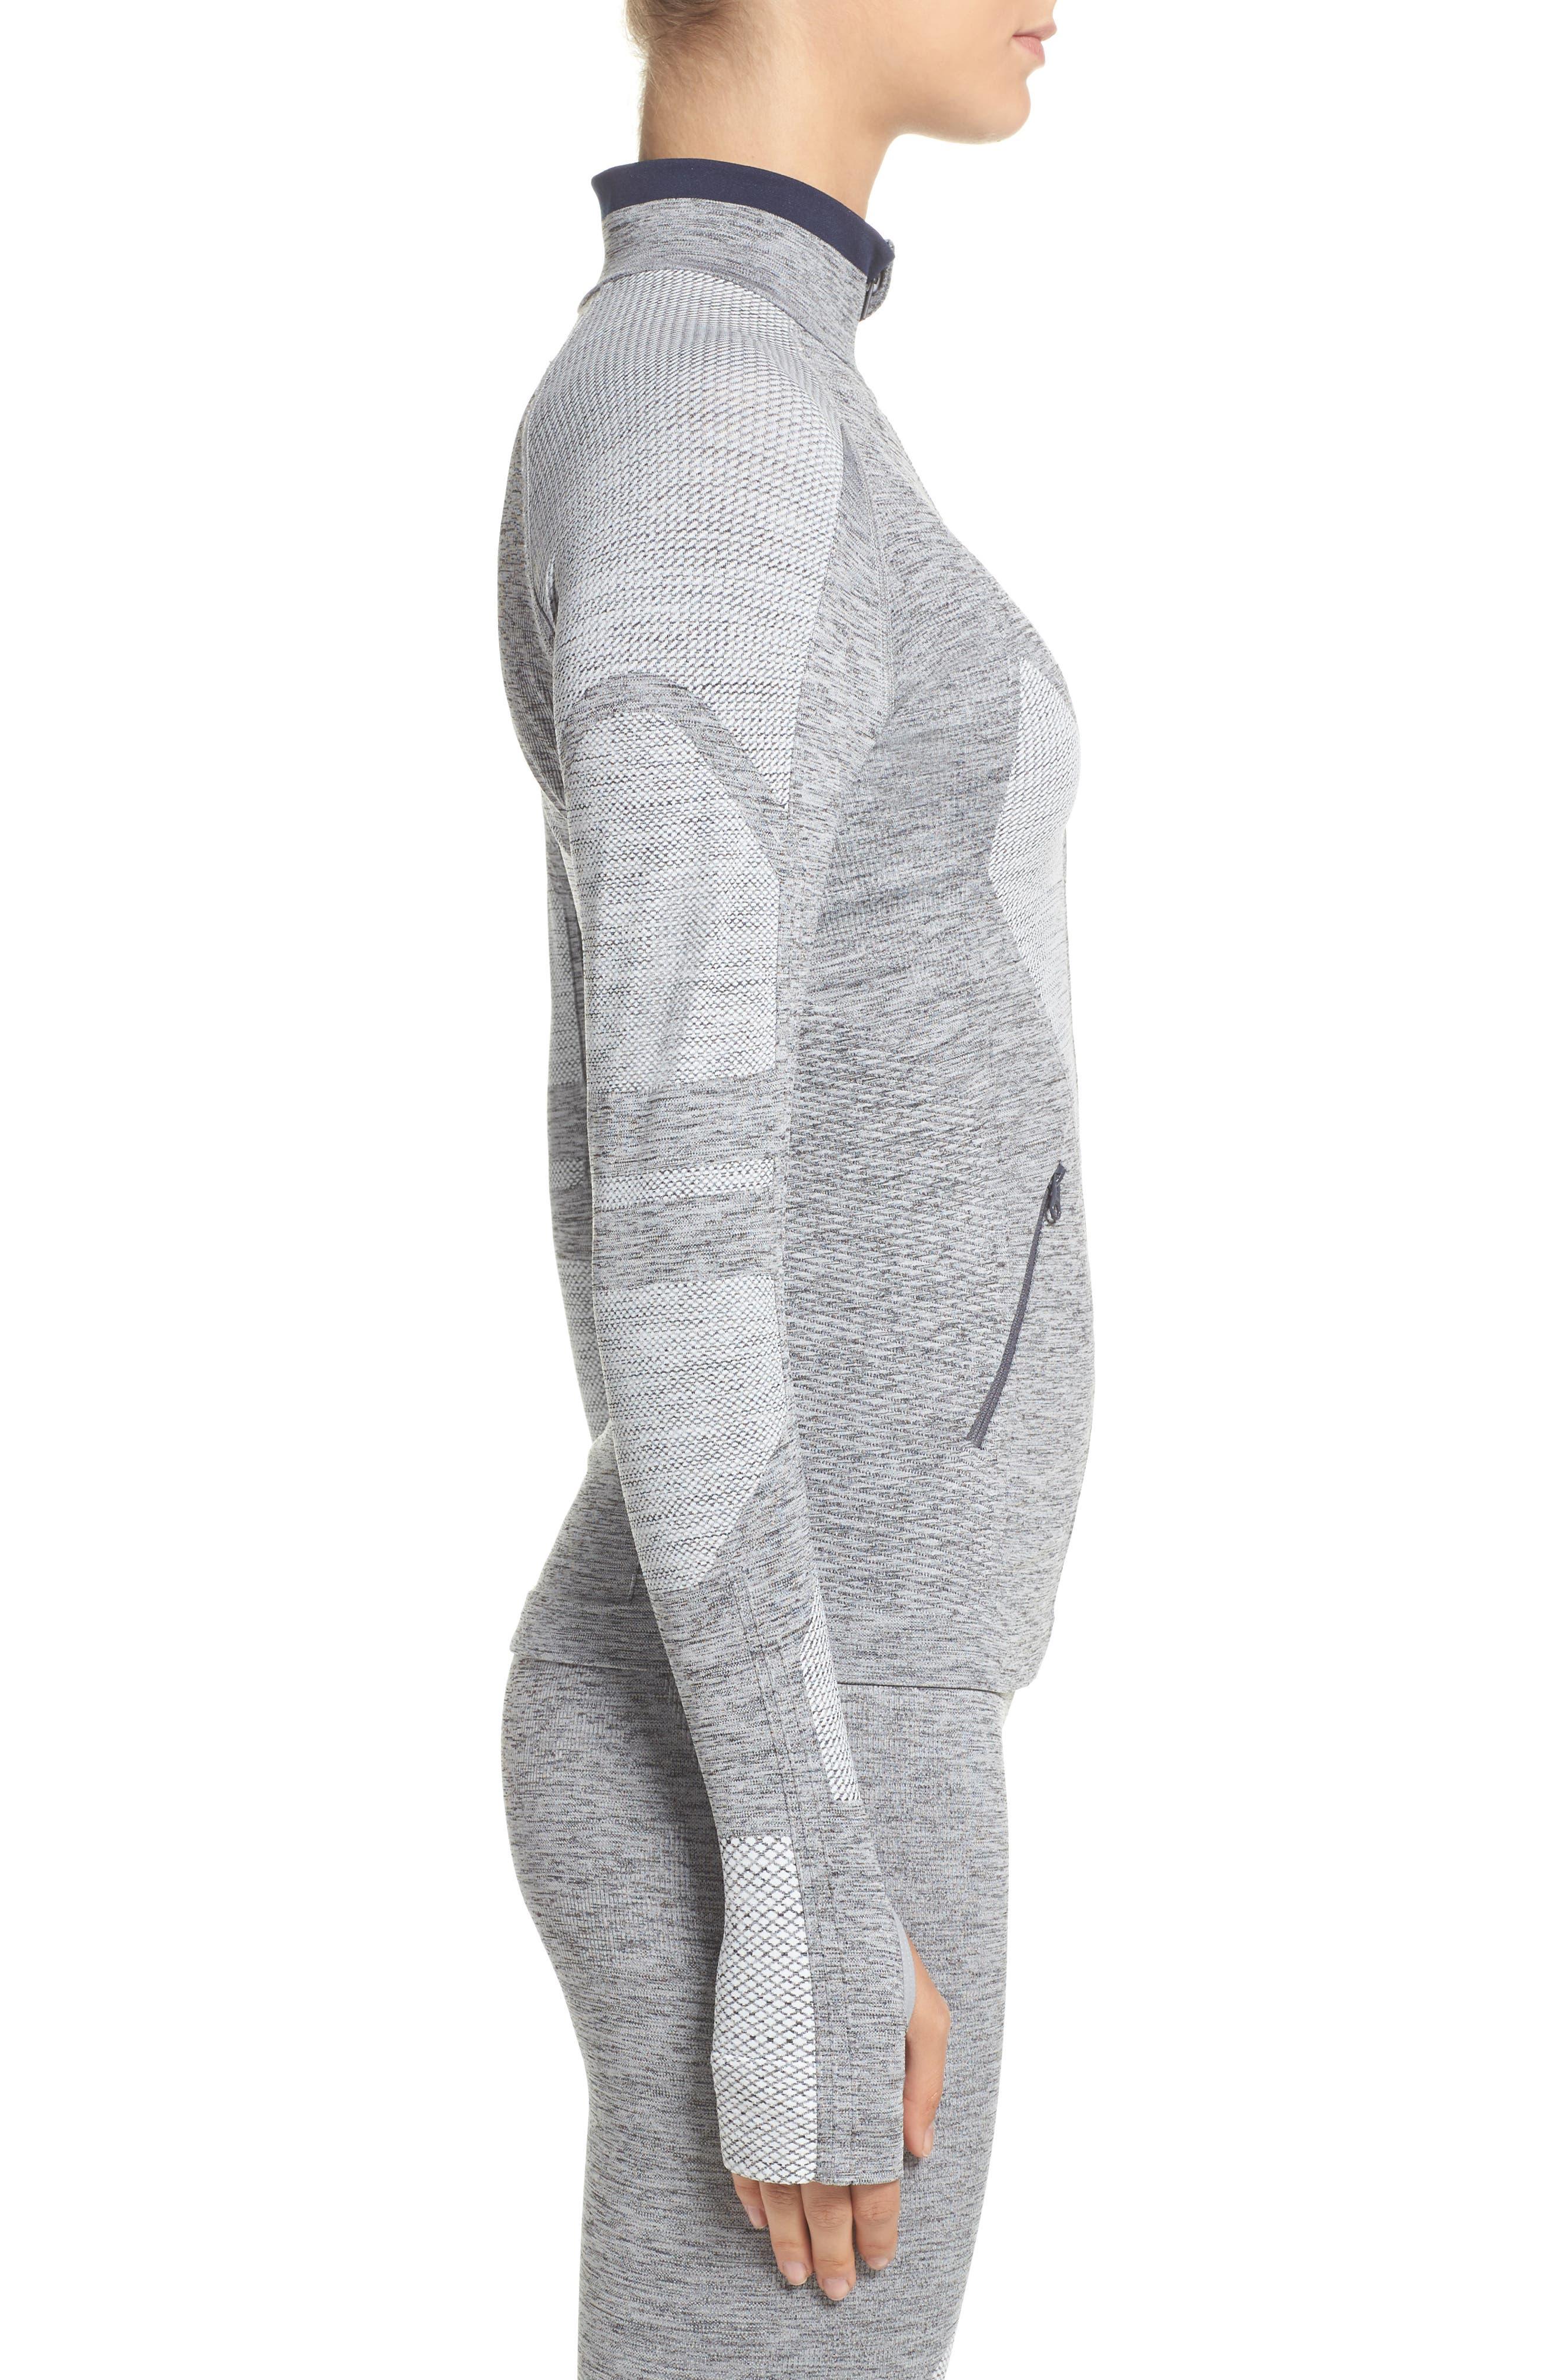 Summit Seamless Jacket,                             Alternate thumbnail 3, color,                             Grey Marl